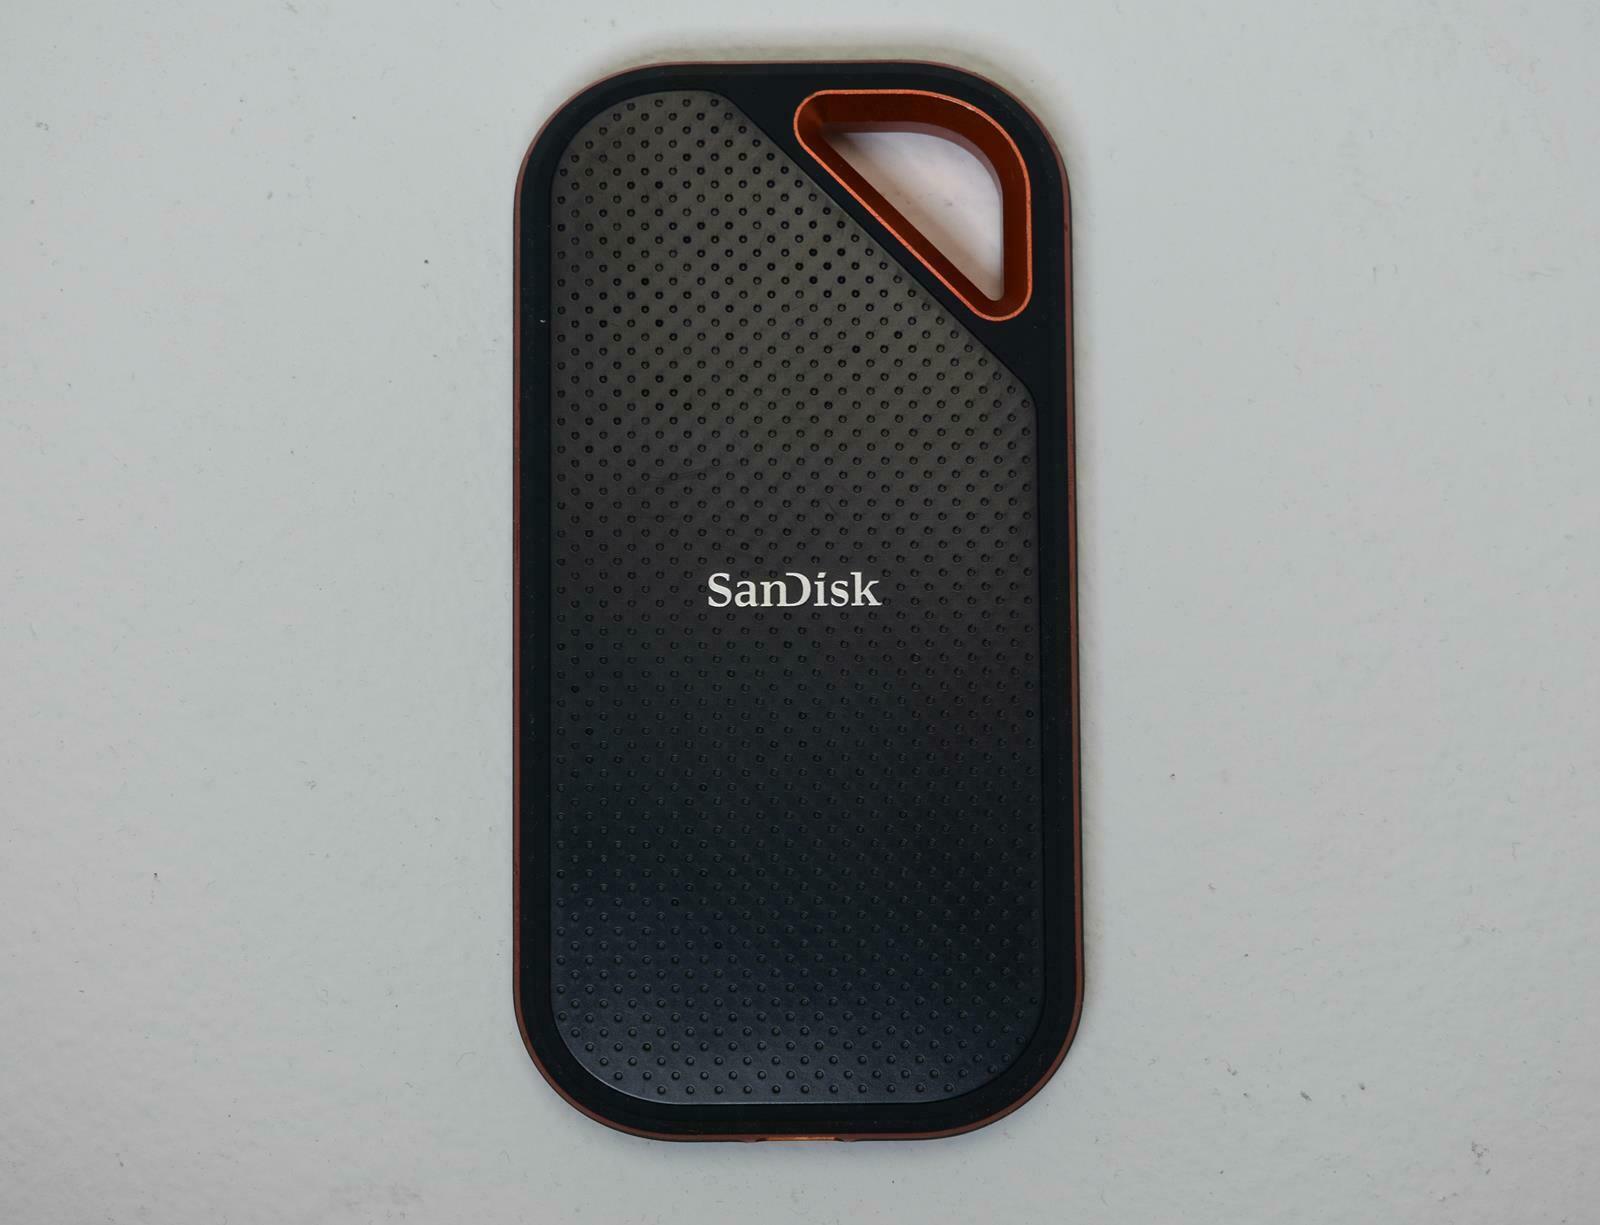 SANDISK SDSSDE80-2T00 PORTABLE 2TB USB3.0 - $261.13